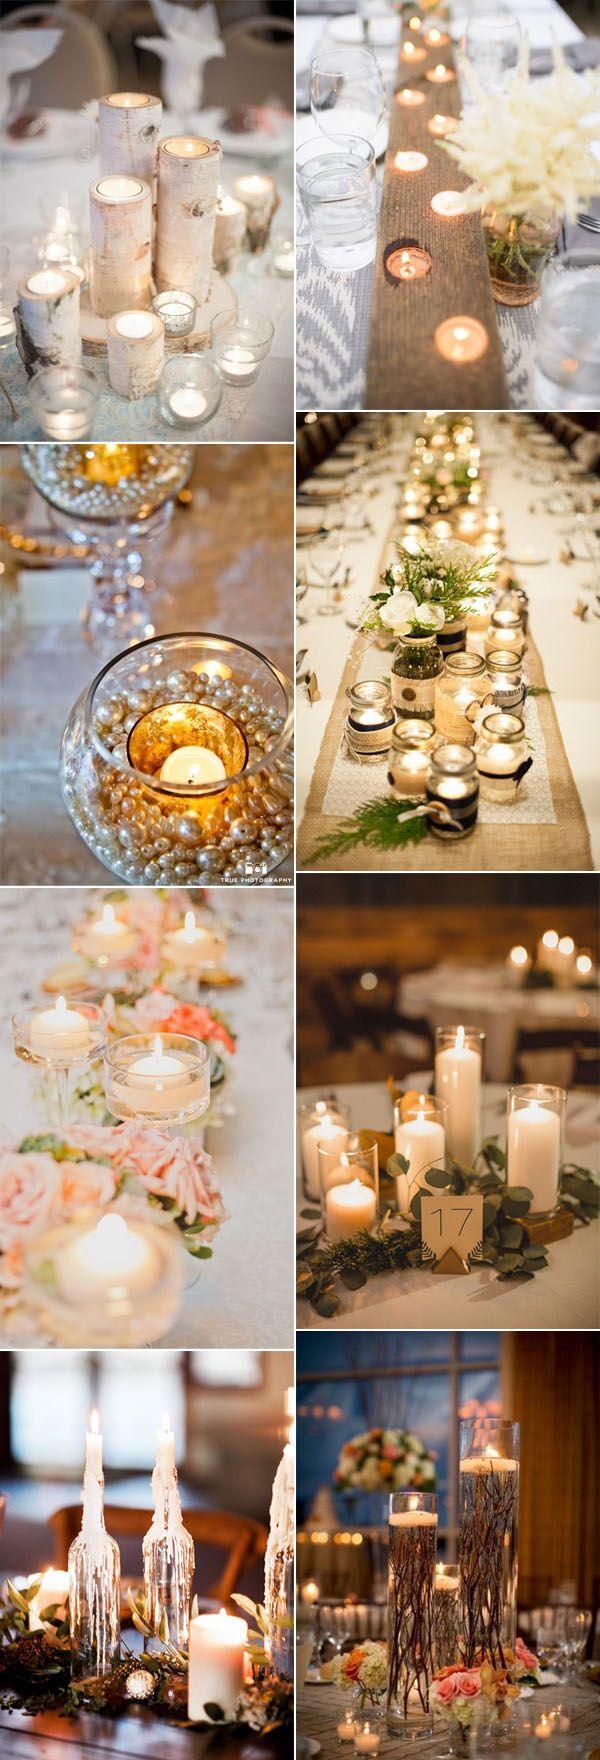 creative candlelights wedding centerpieces inspiration